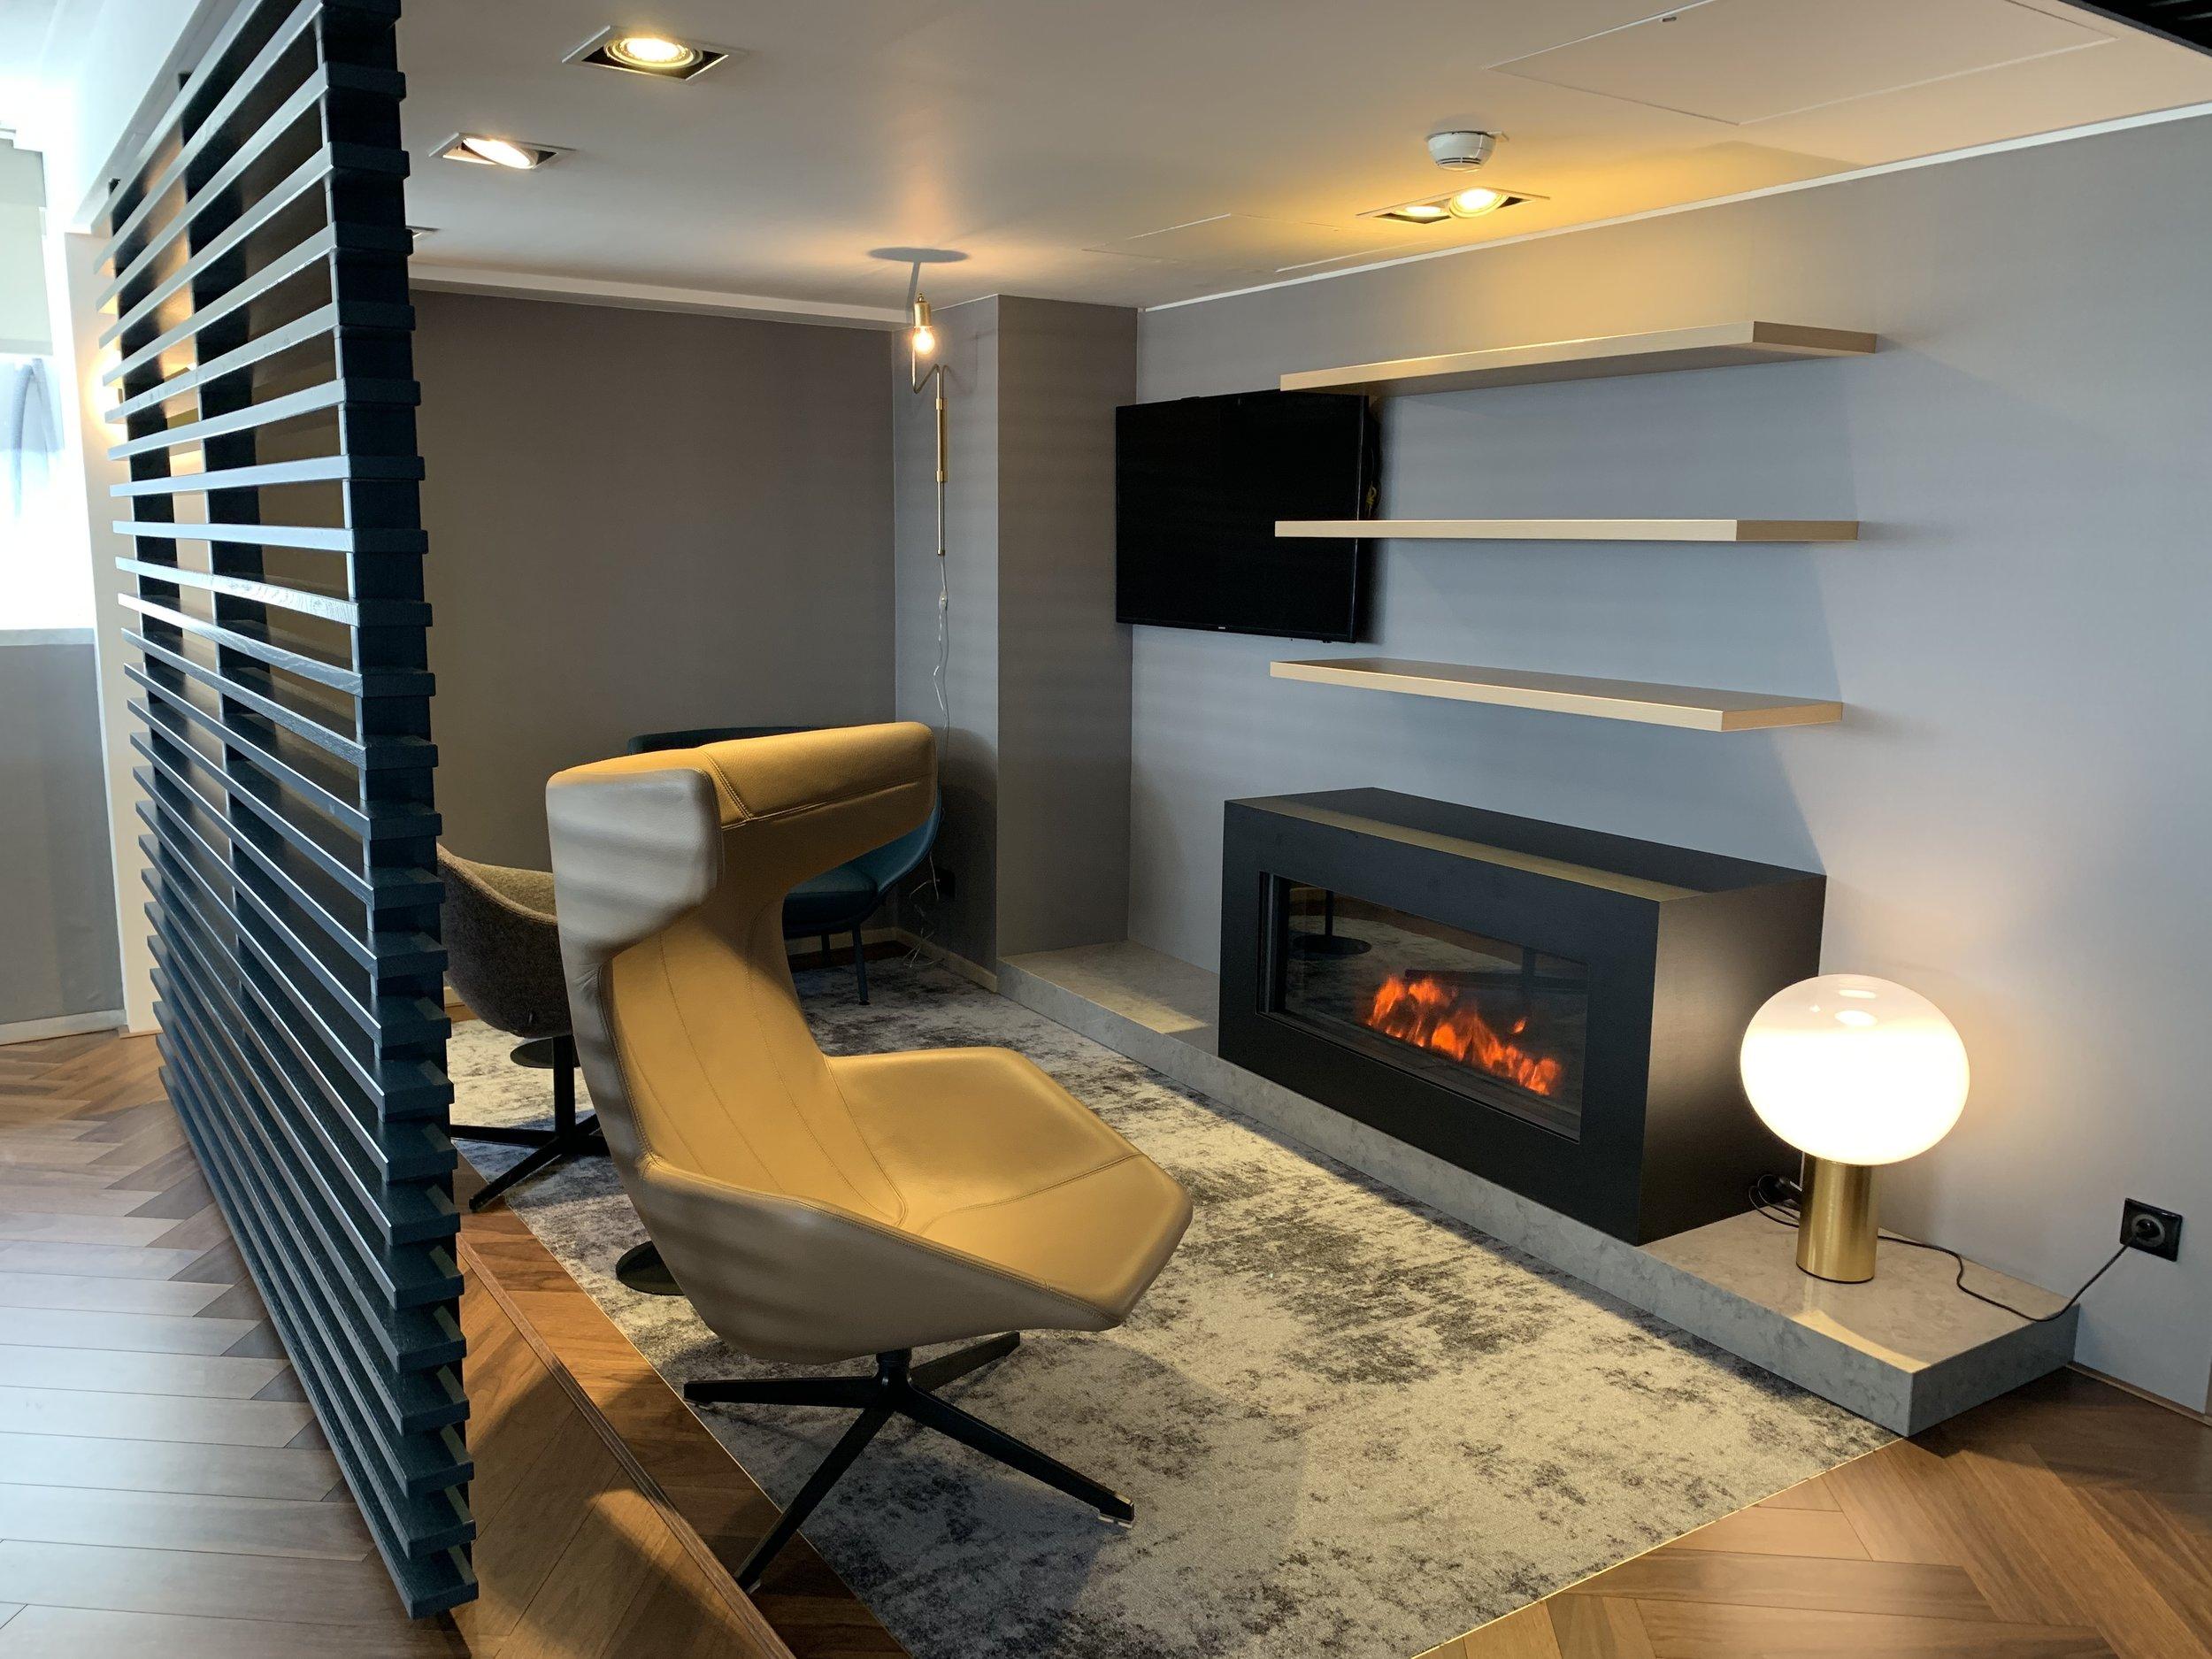 New Refurbished Star Alliance Lounge Paris Charles De Gaulle.jpeg